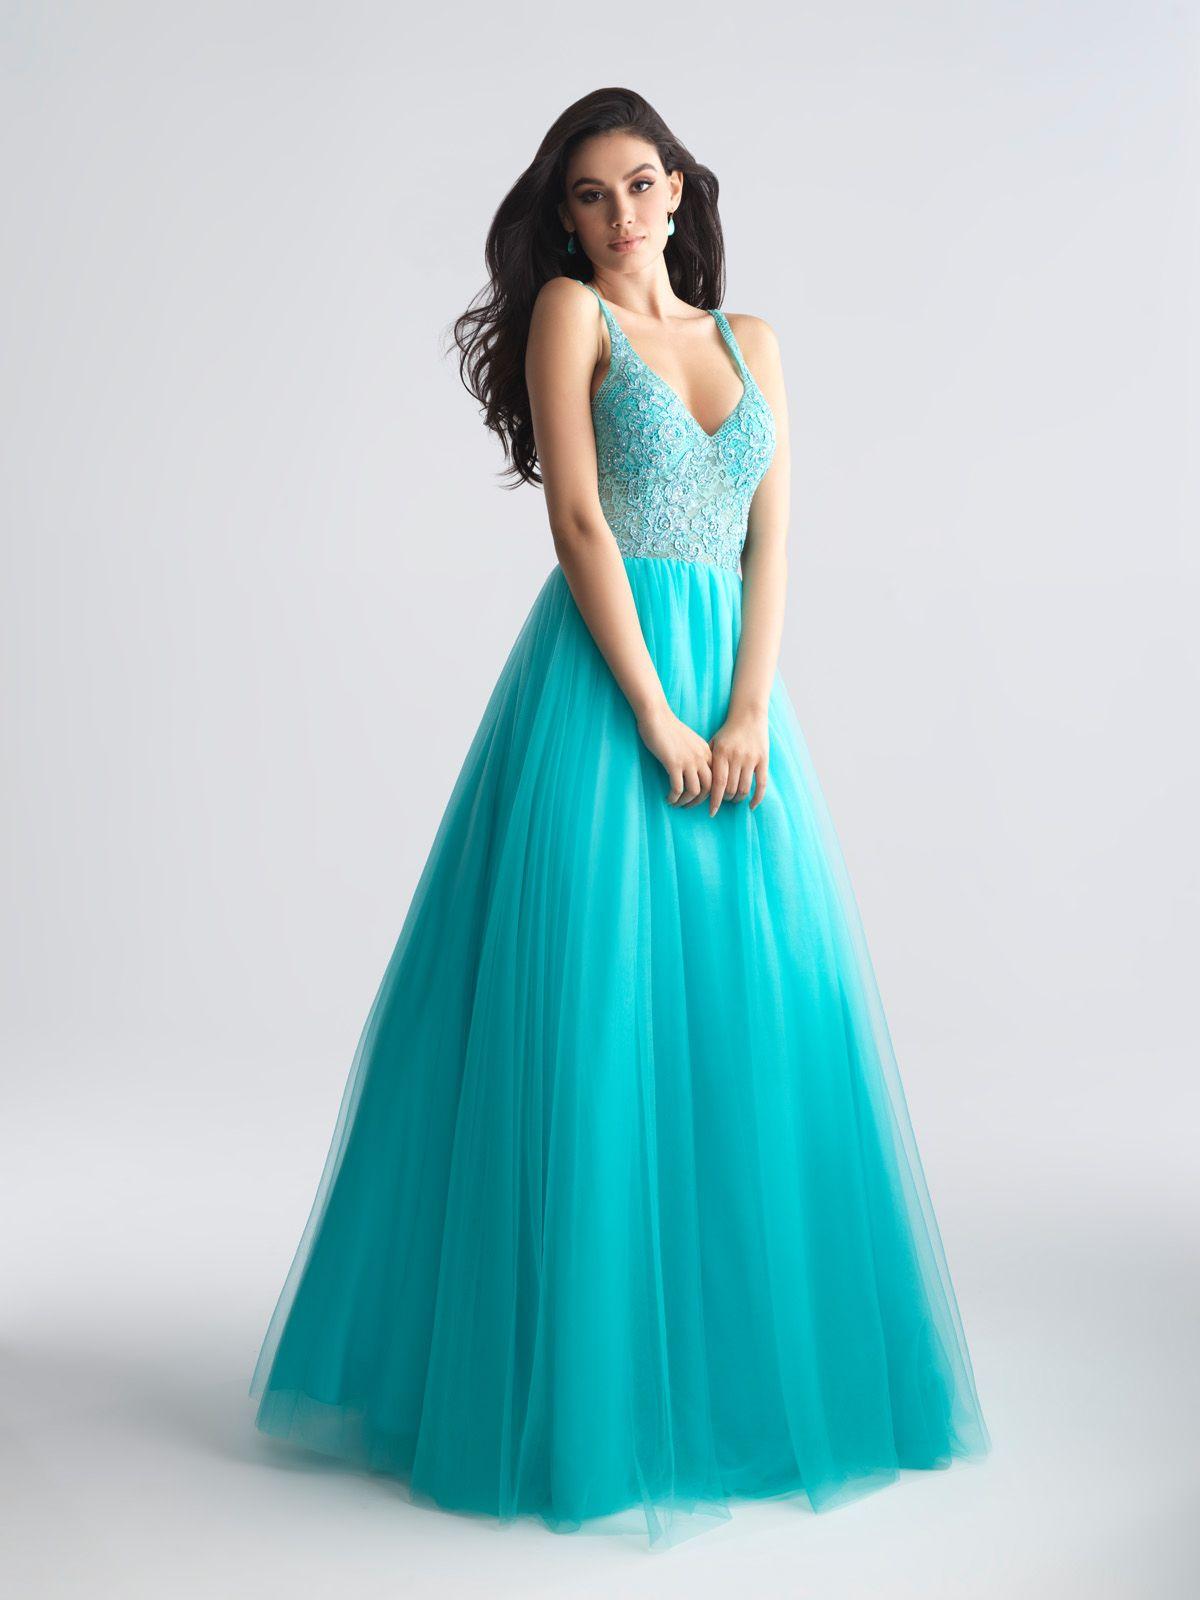 Madison James 18-668 - International Prom Association Dresses ...